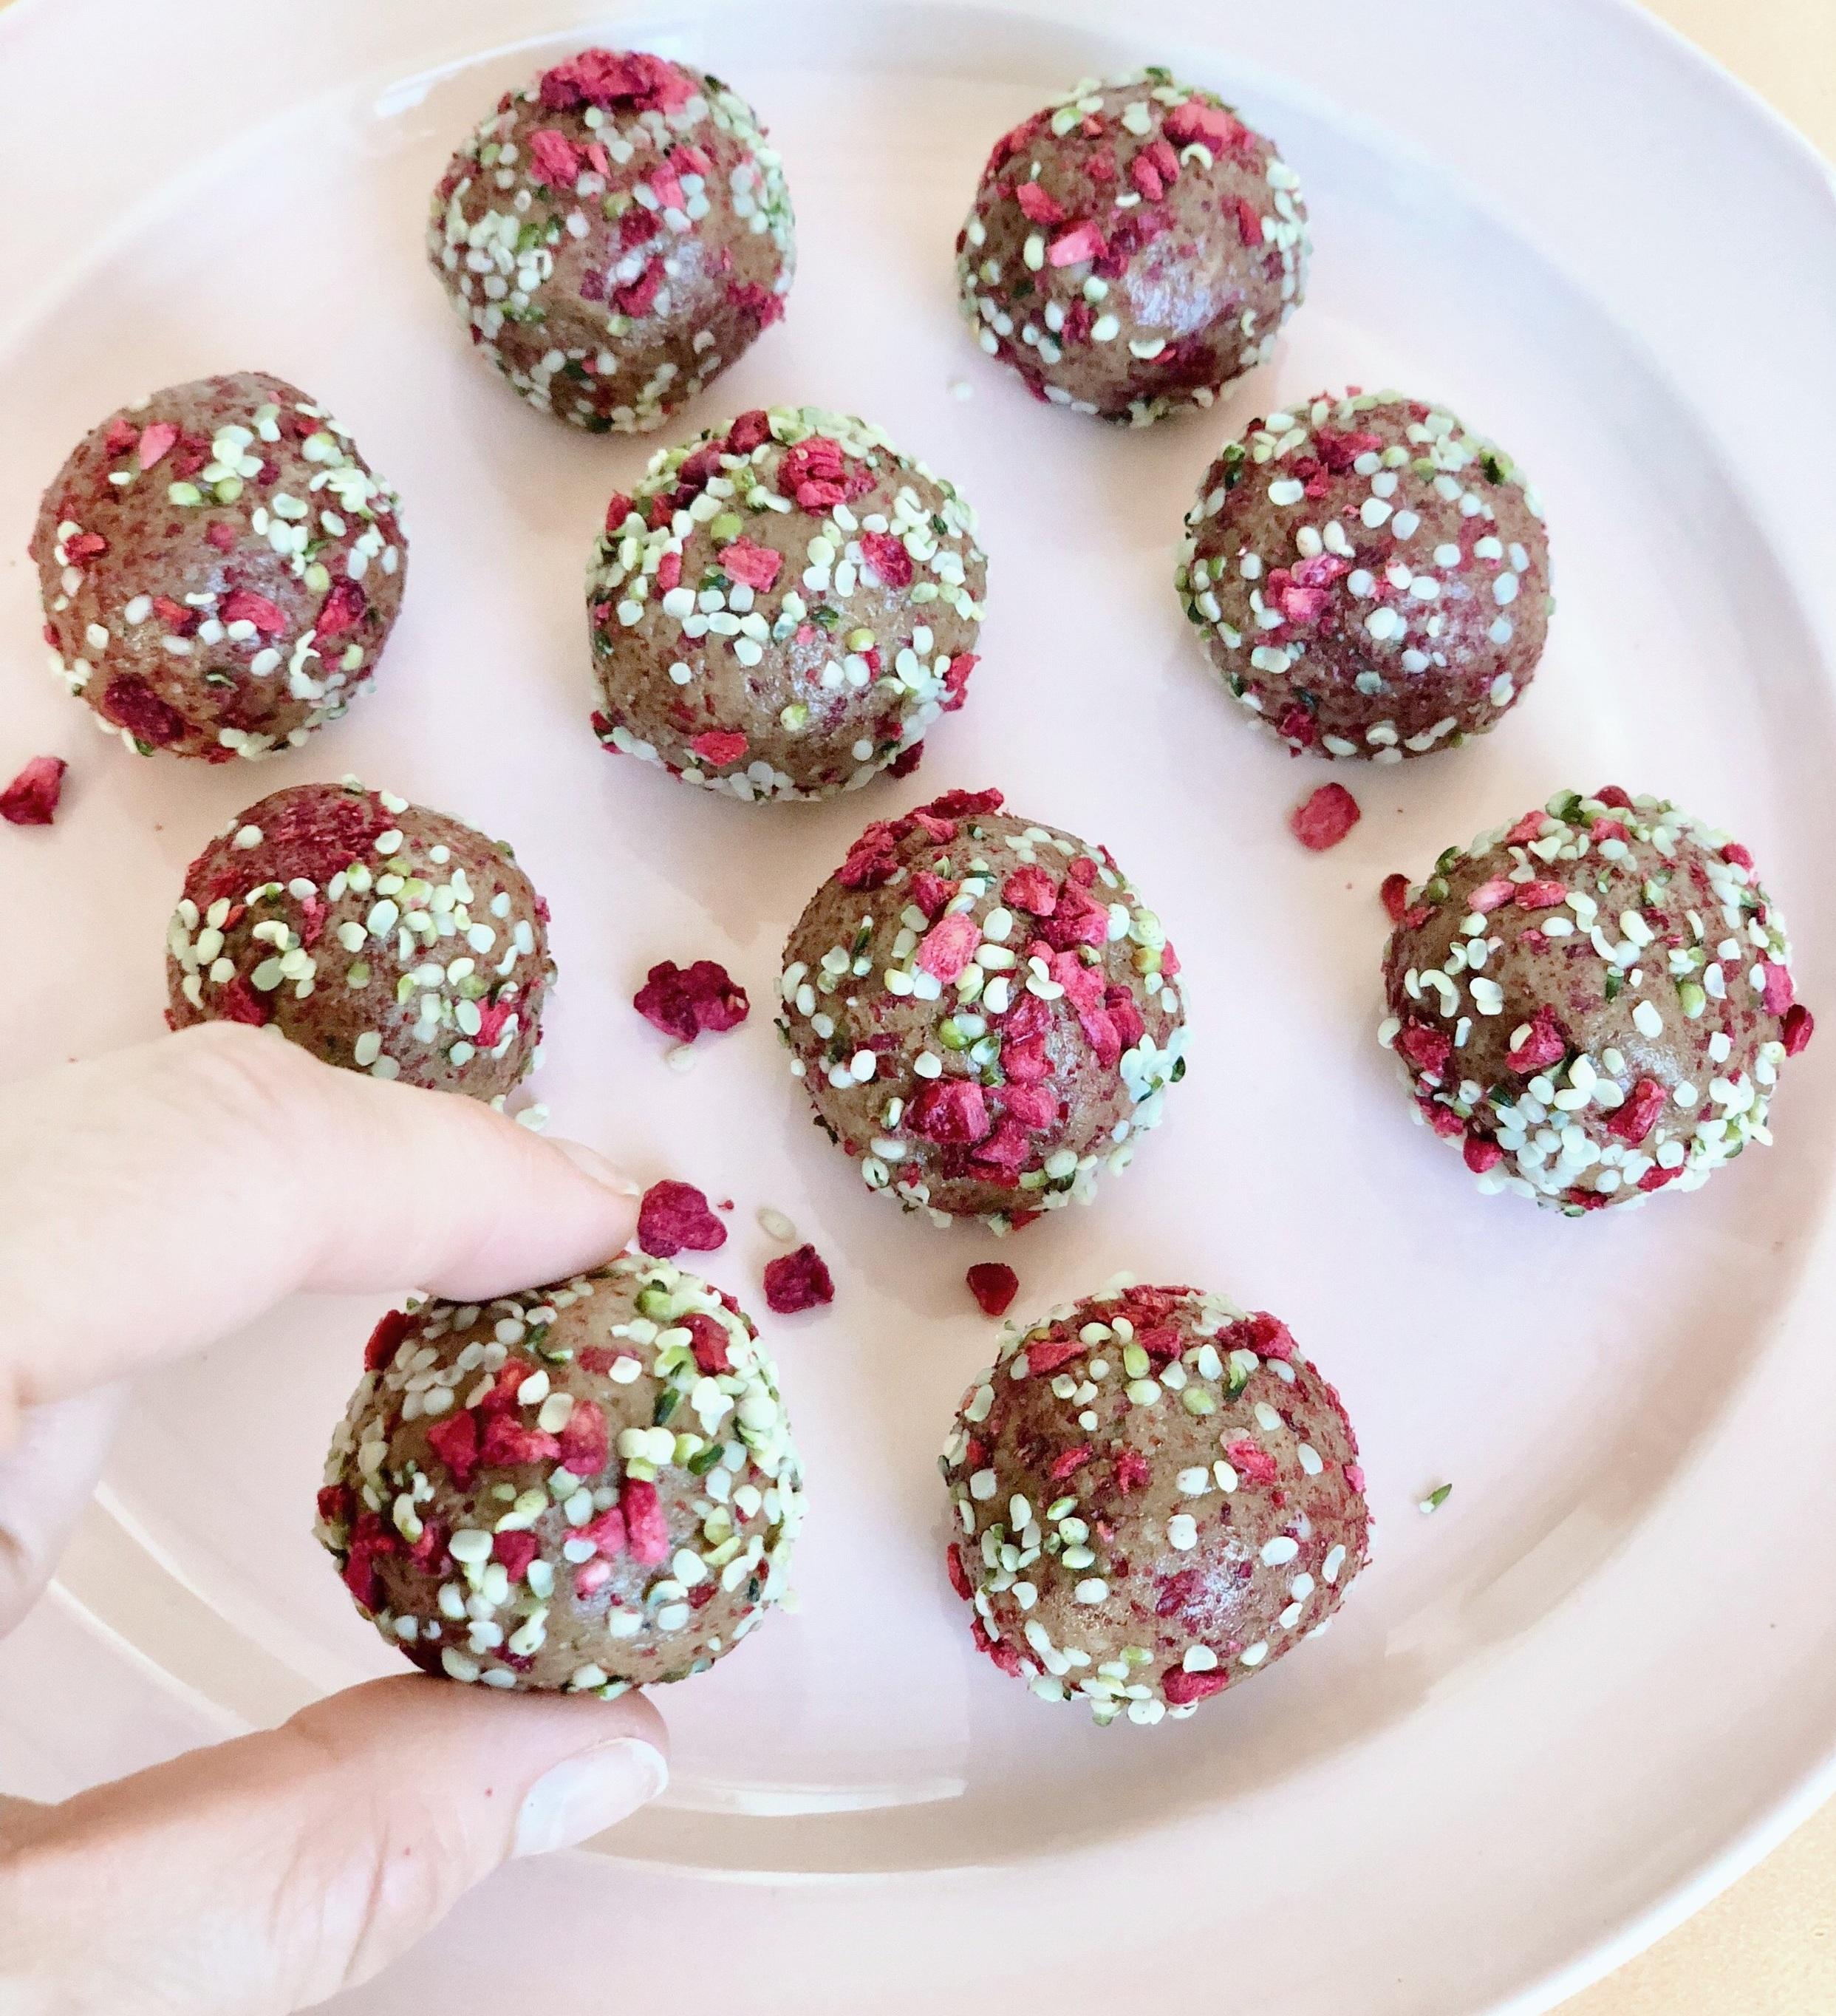 Sunbutter+protein+balls